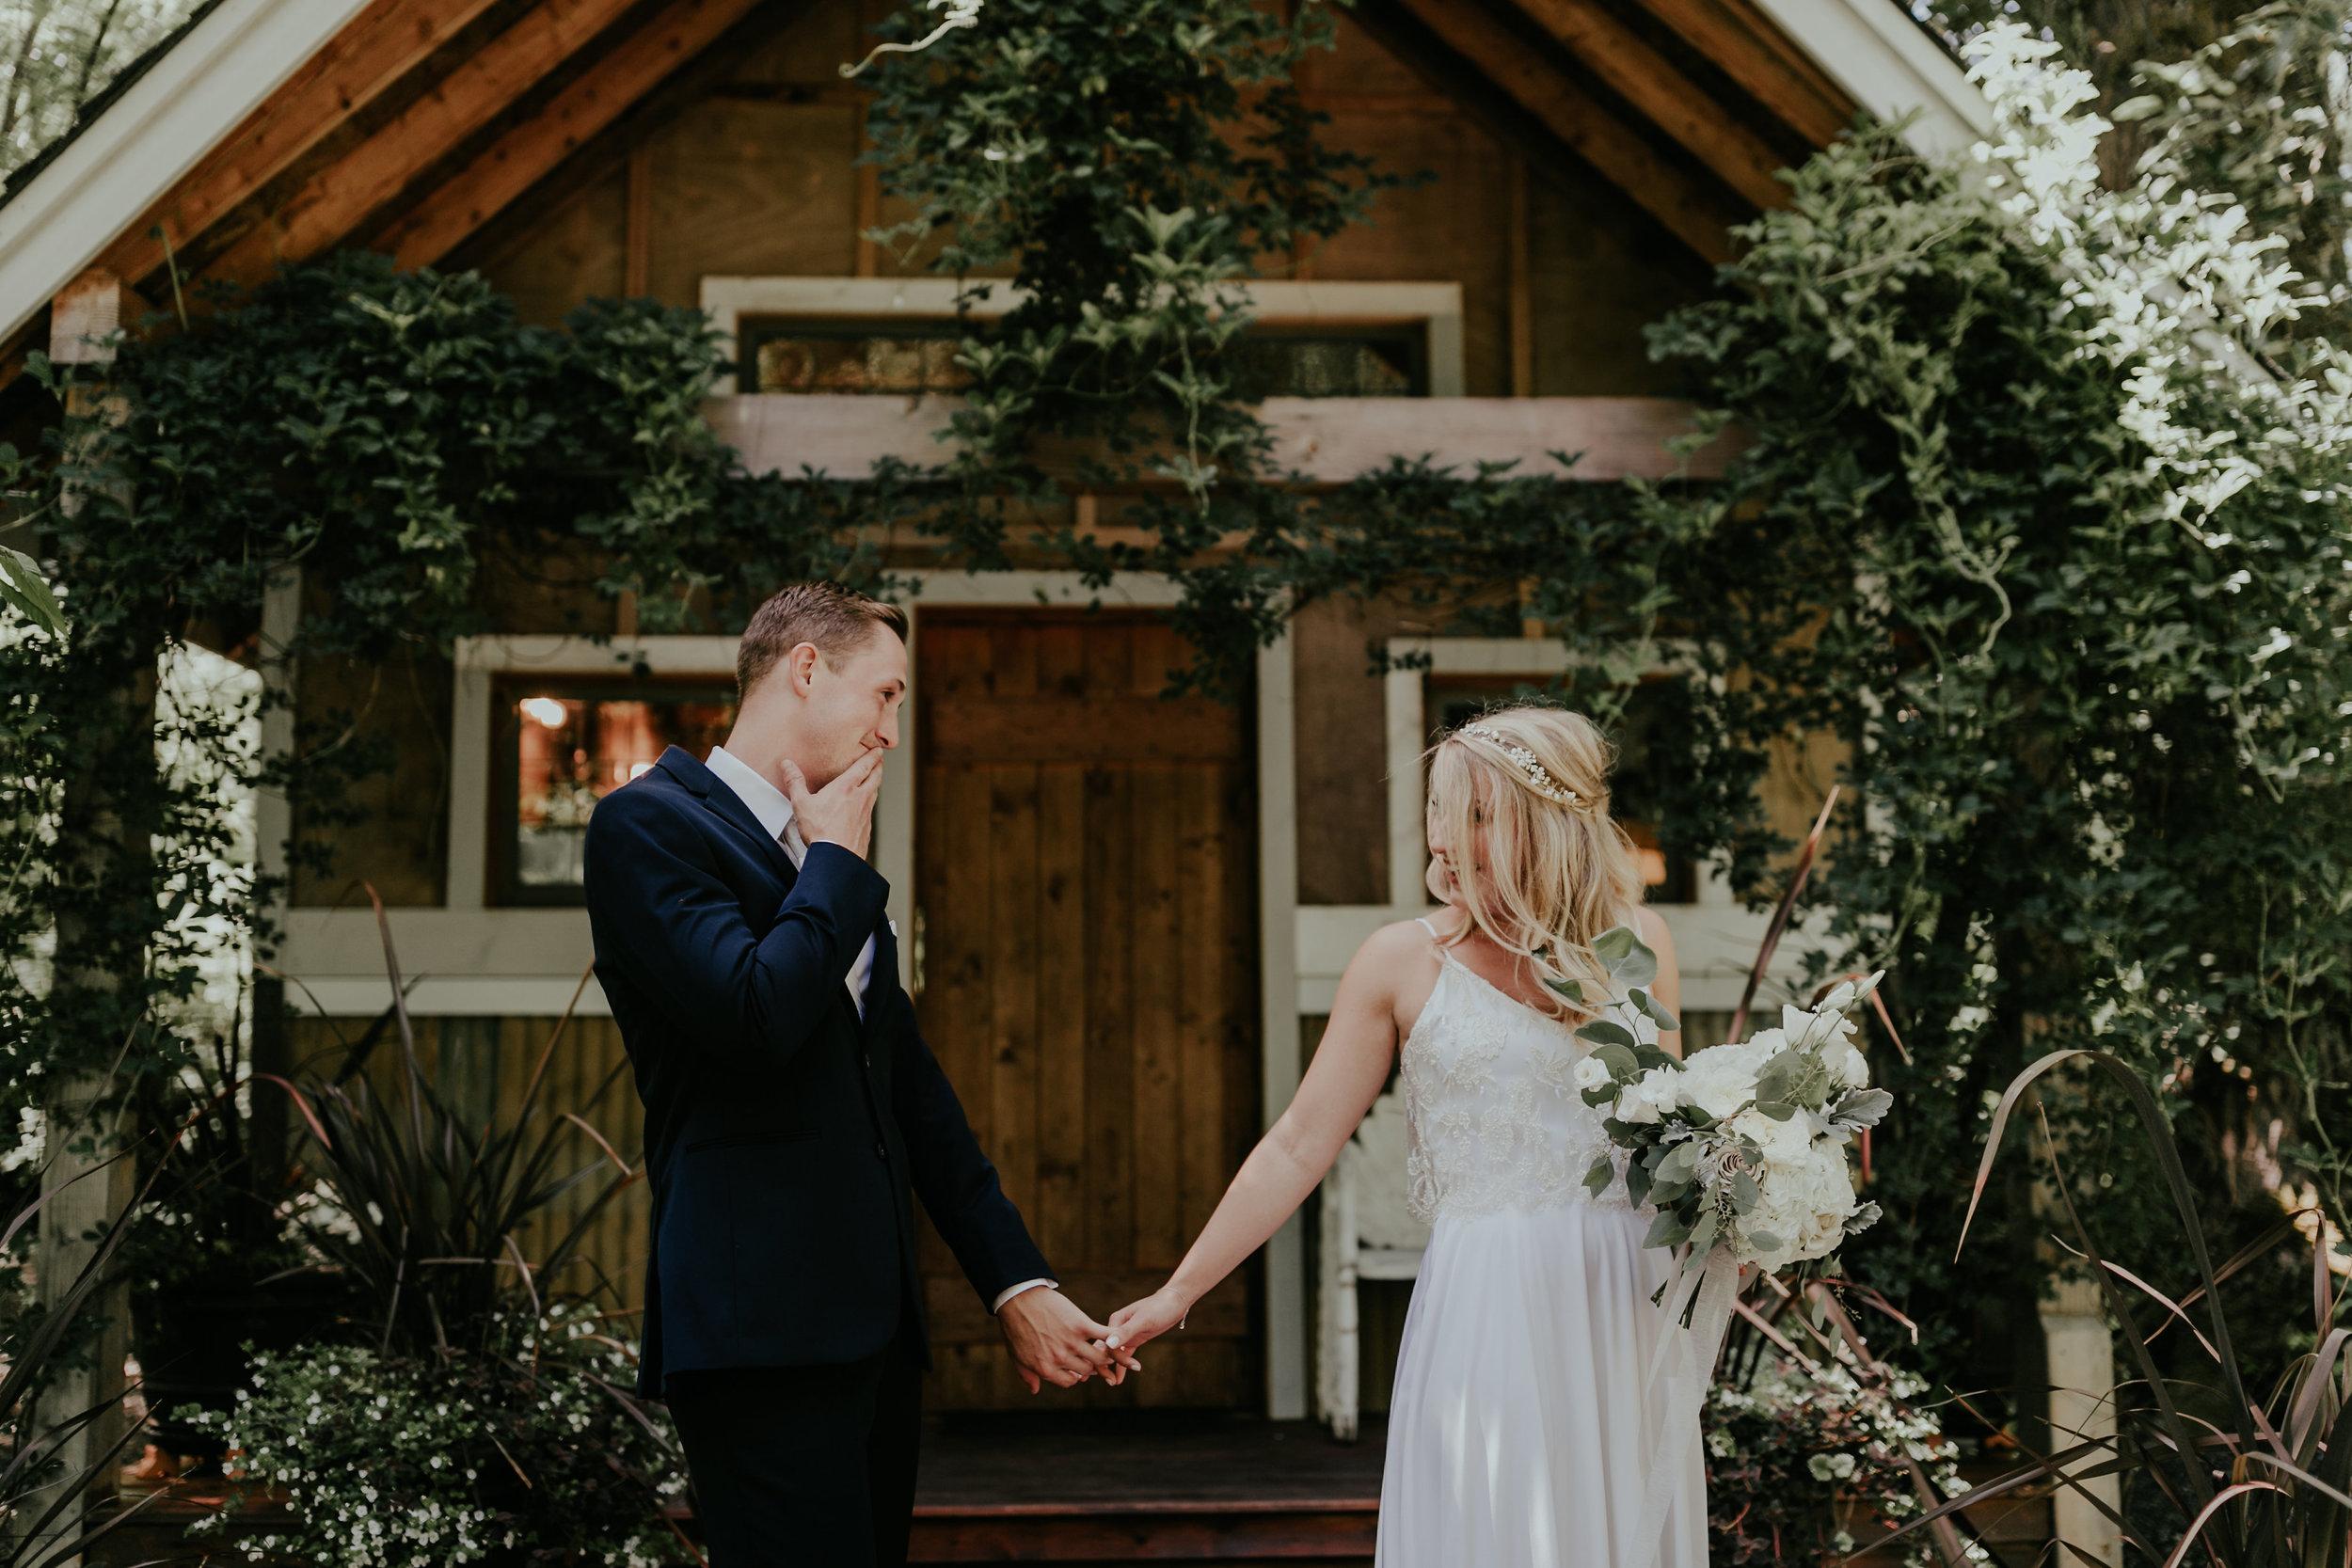 downs_wedding_-85.jpg